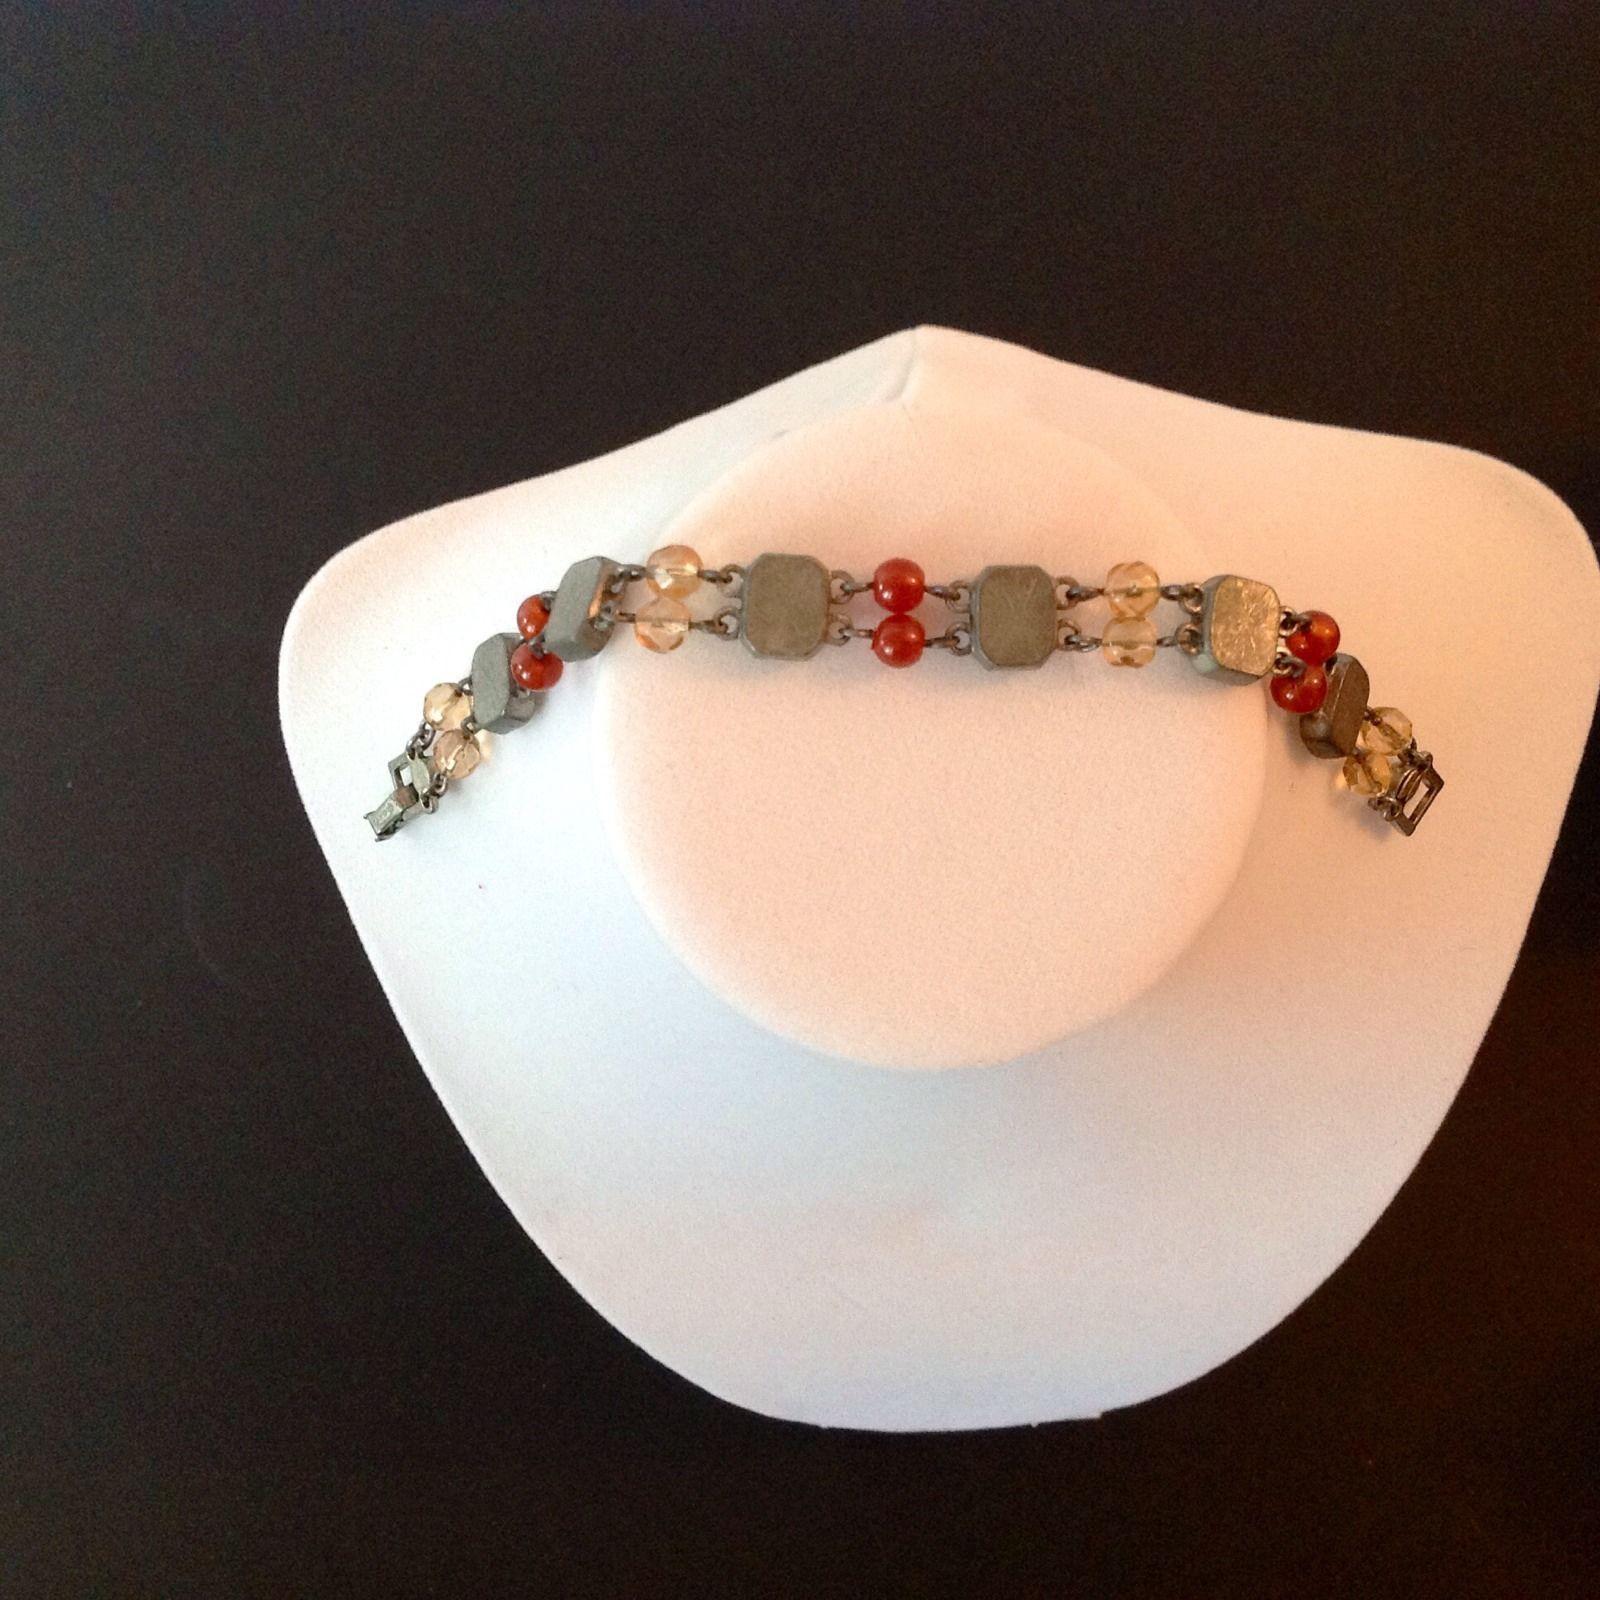 Avon Necklace Bracelet Earrings 3 Piece Set Signed Colored Stones 2002 Vintage image 7